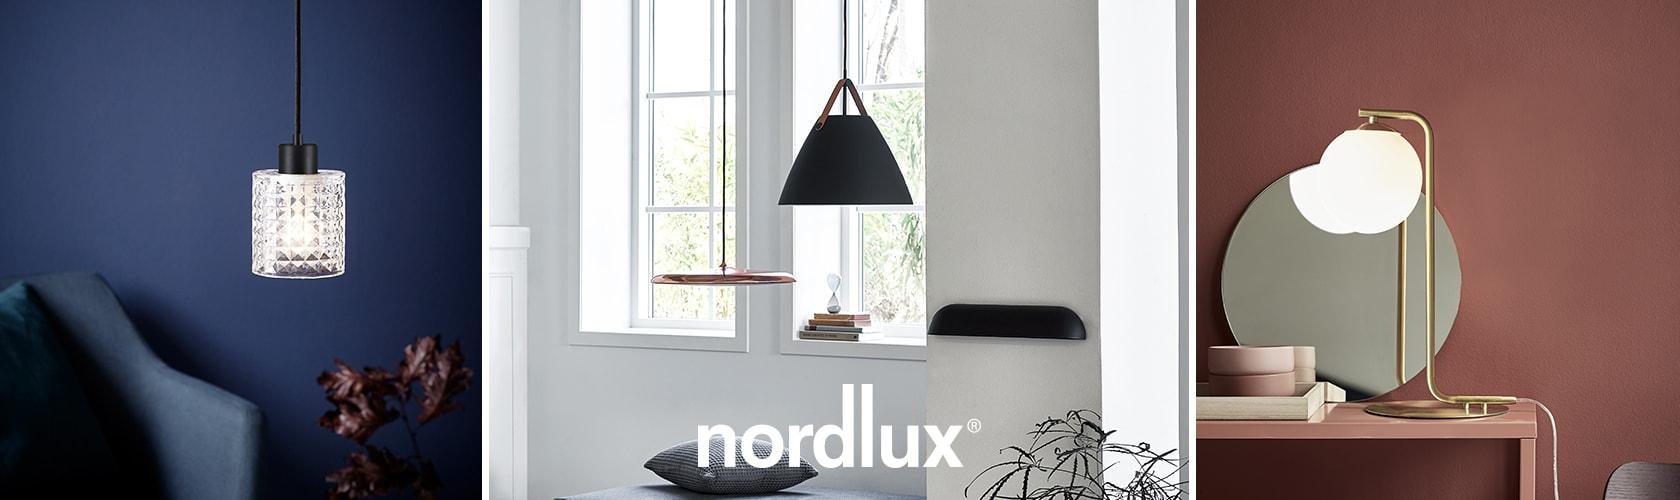 NORDLUX | SILVAN